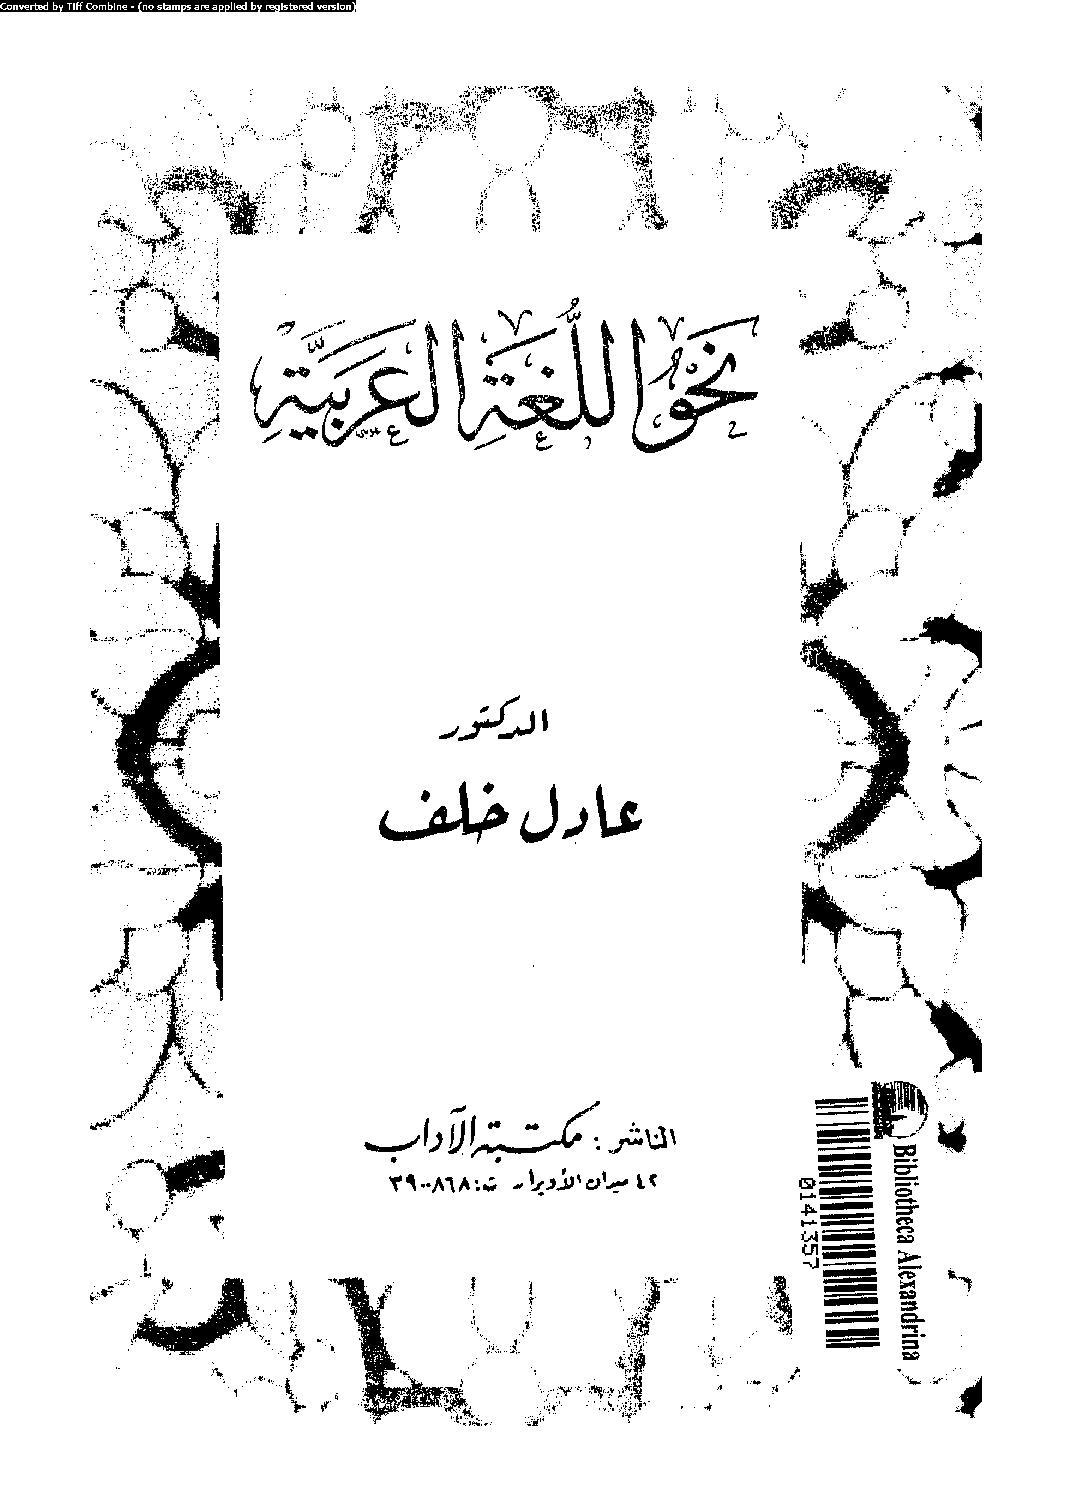 42256 964book1 2097 0000 - نحو اللغة العربية pdf - عادل خلف